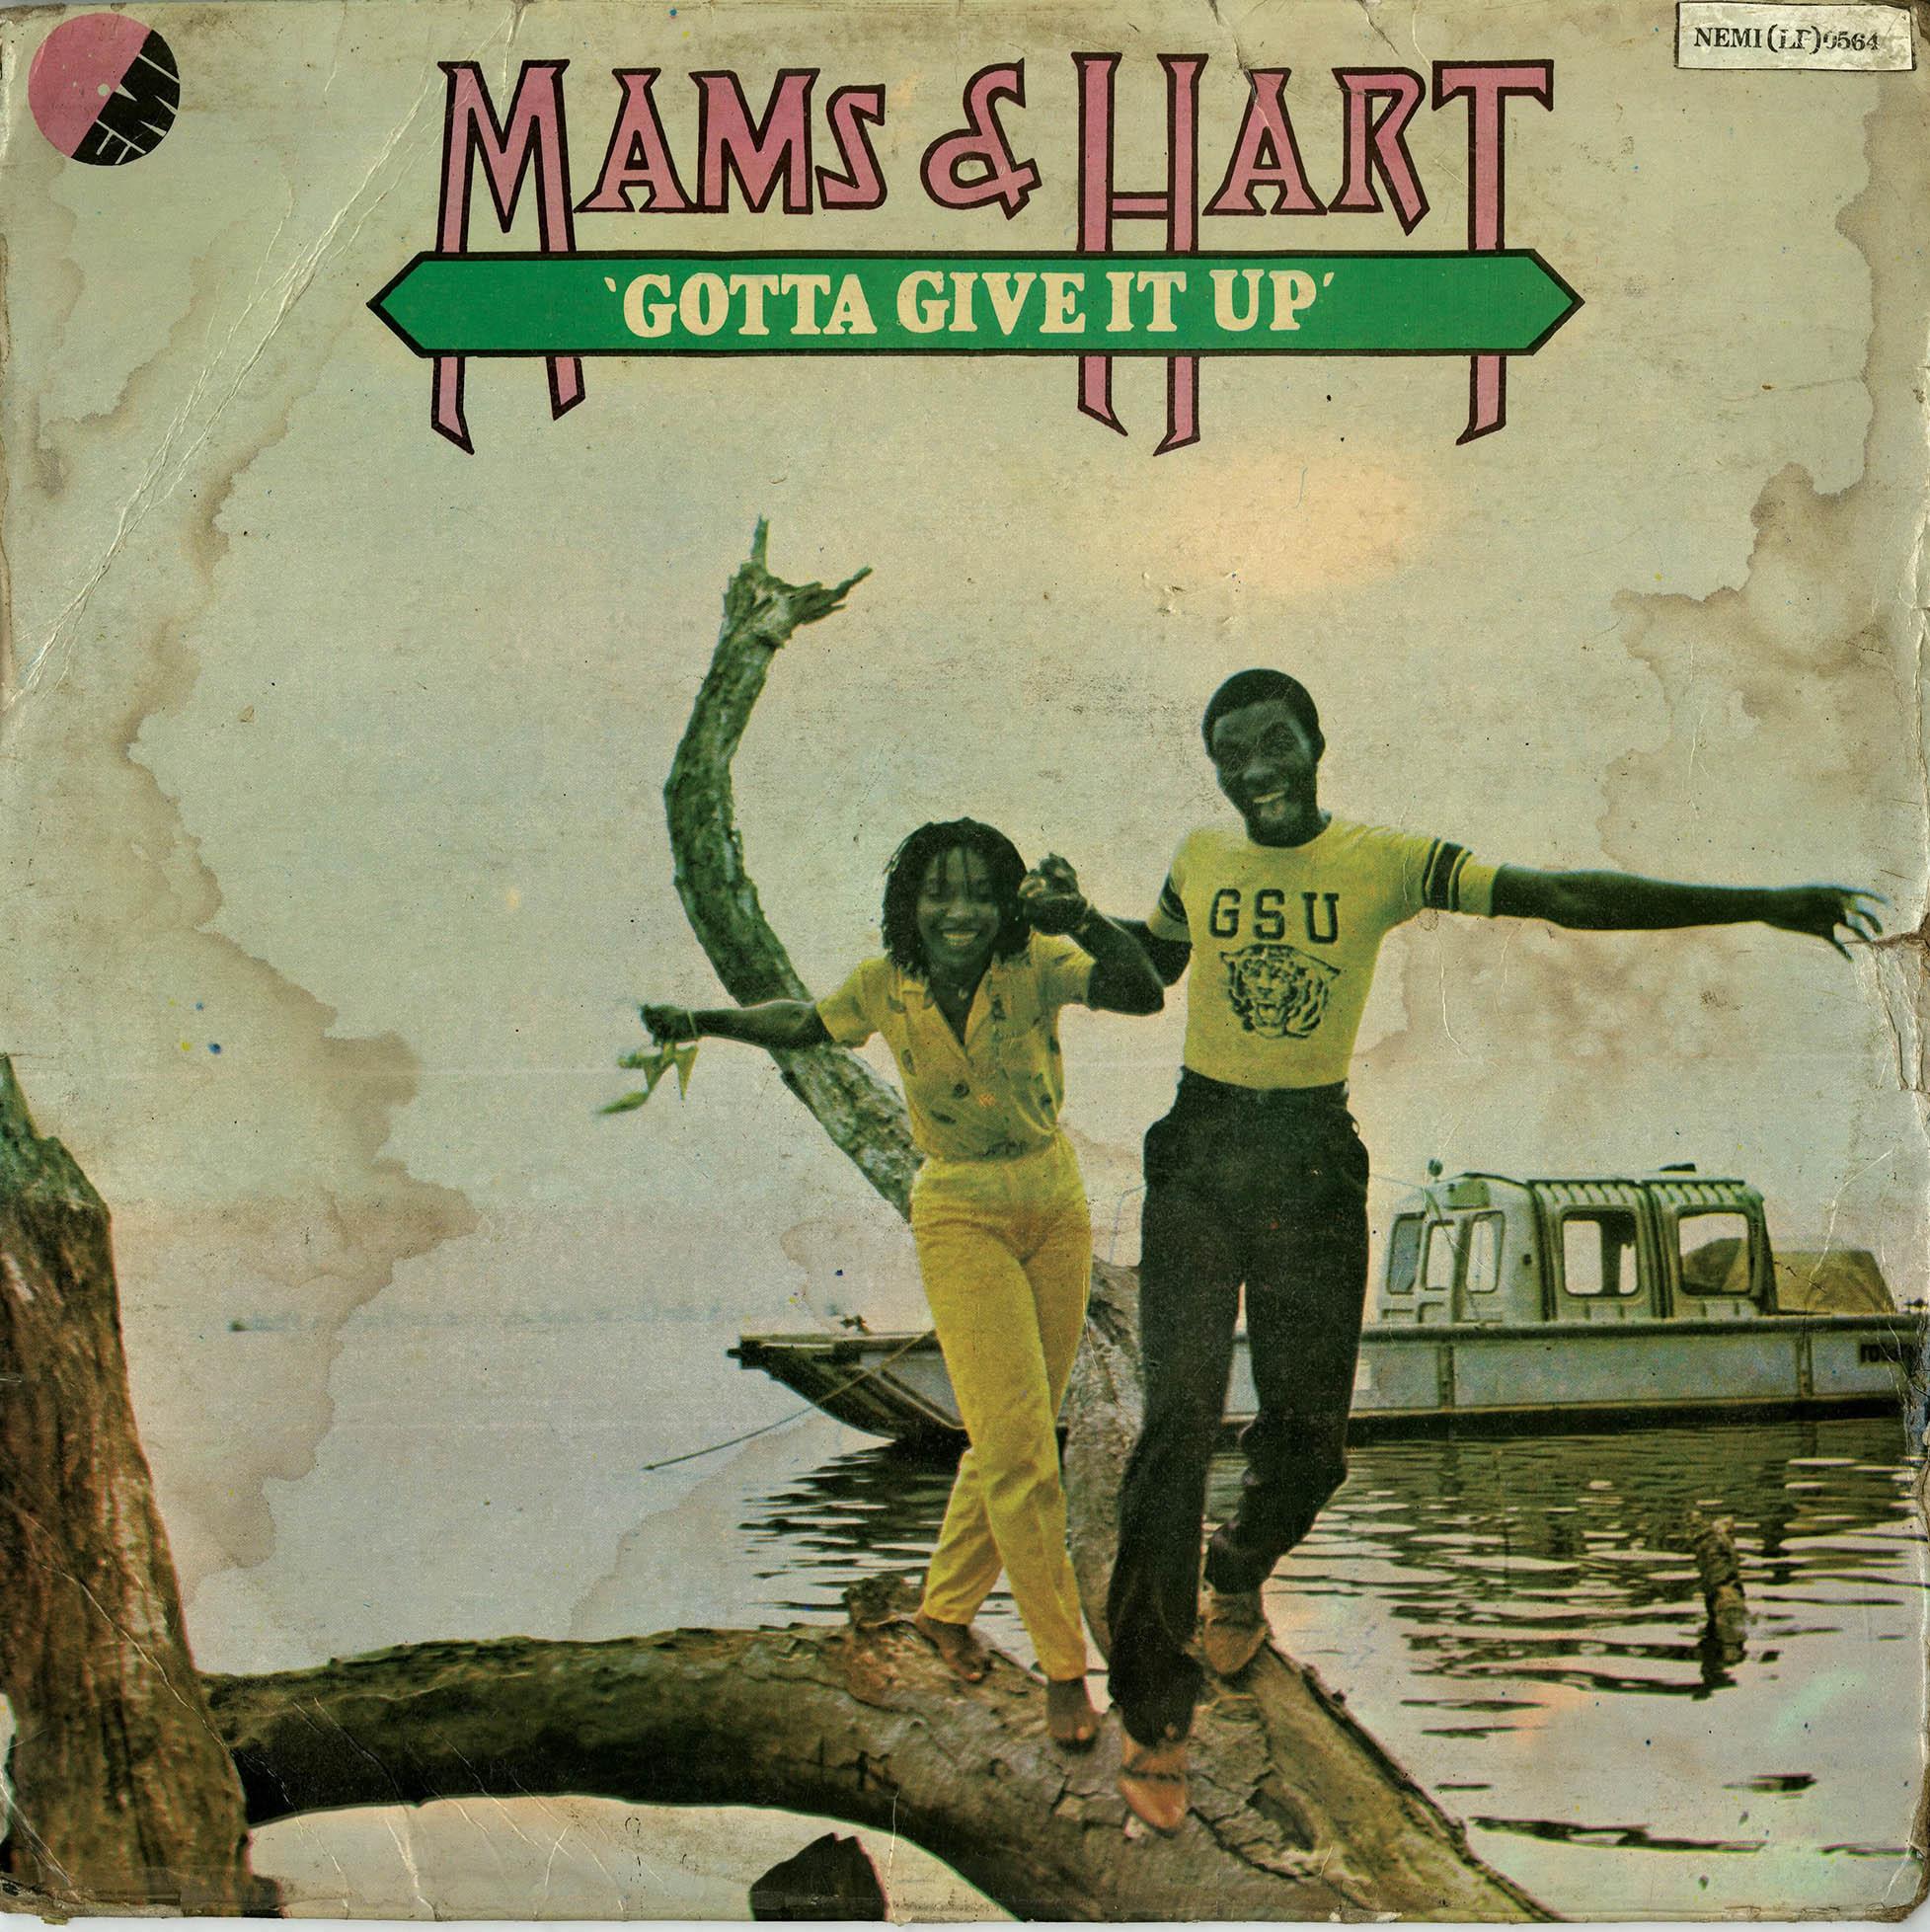 Mams & Hart <i>Gotta Give It Up</i>